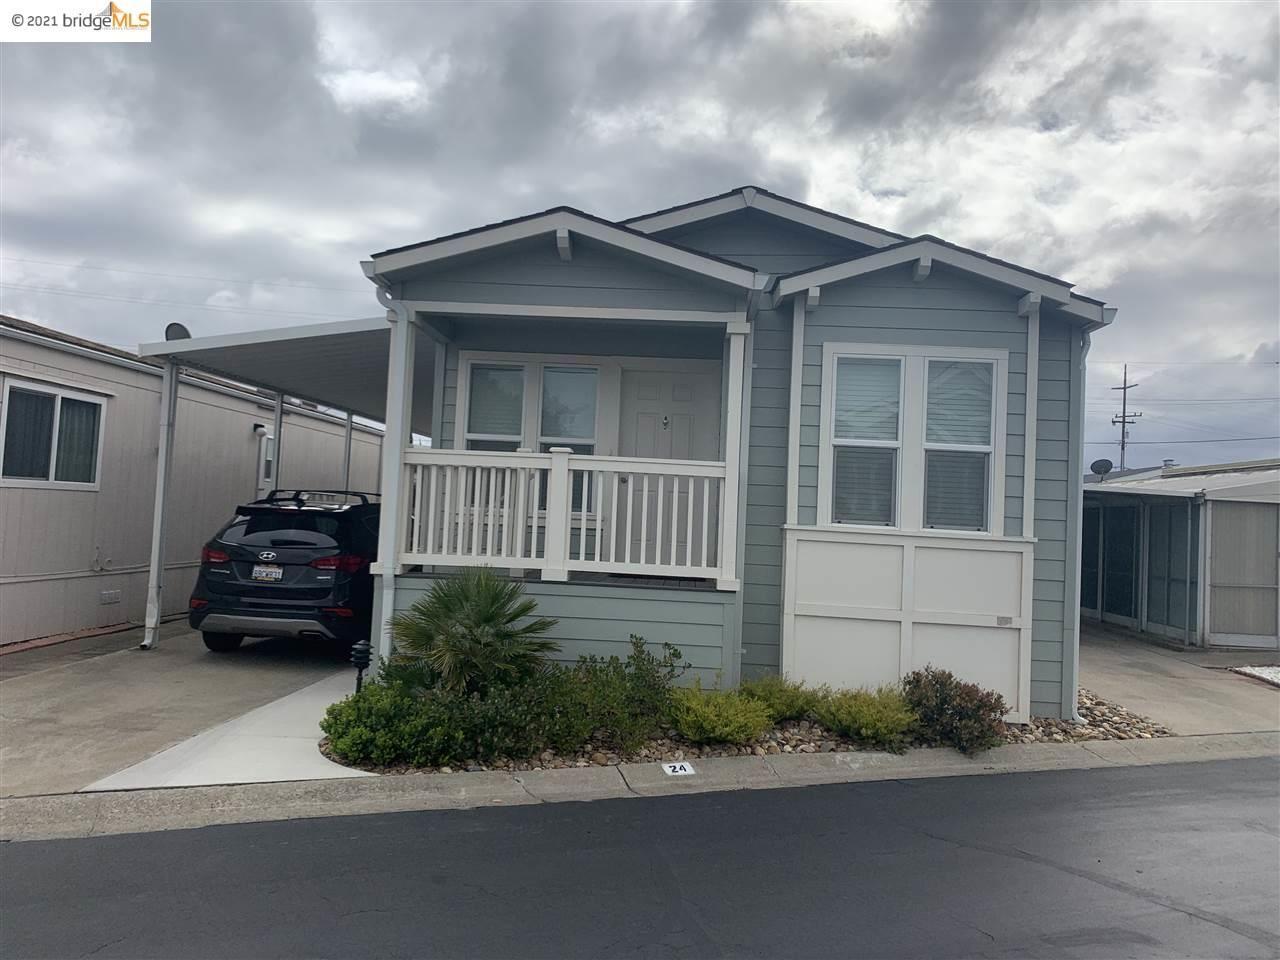 Photo of 24 Otsego  St, OAKLEY, CA 94561 (MLS # 40941414)